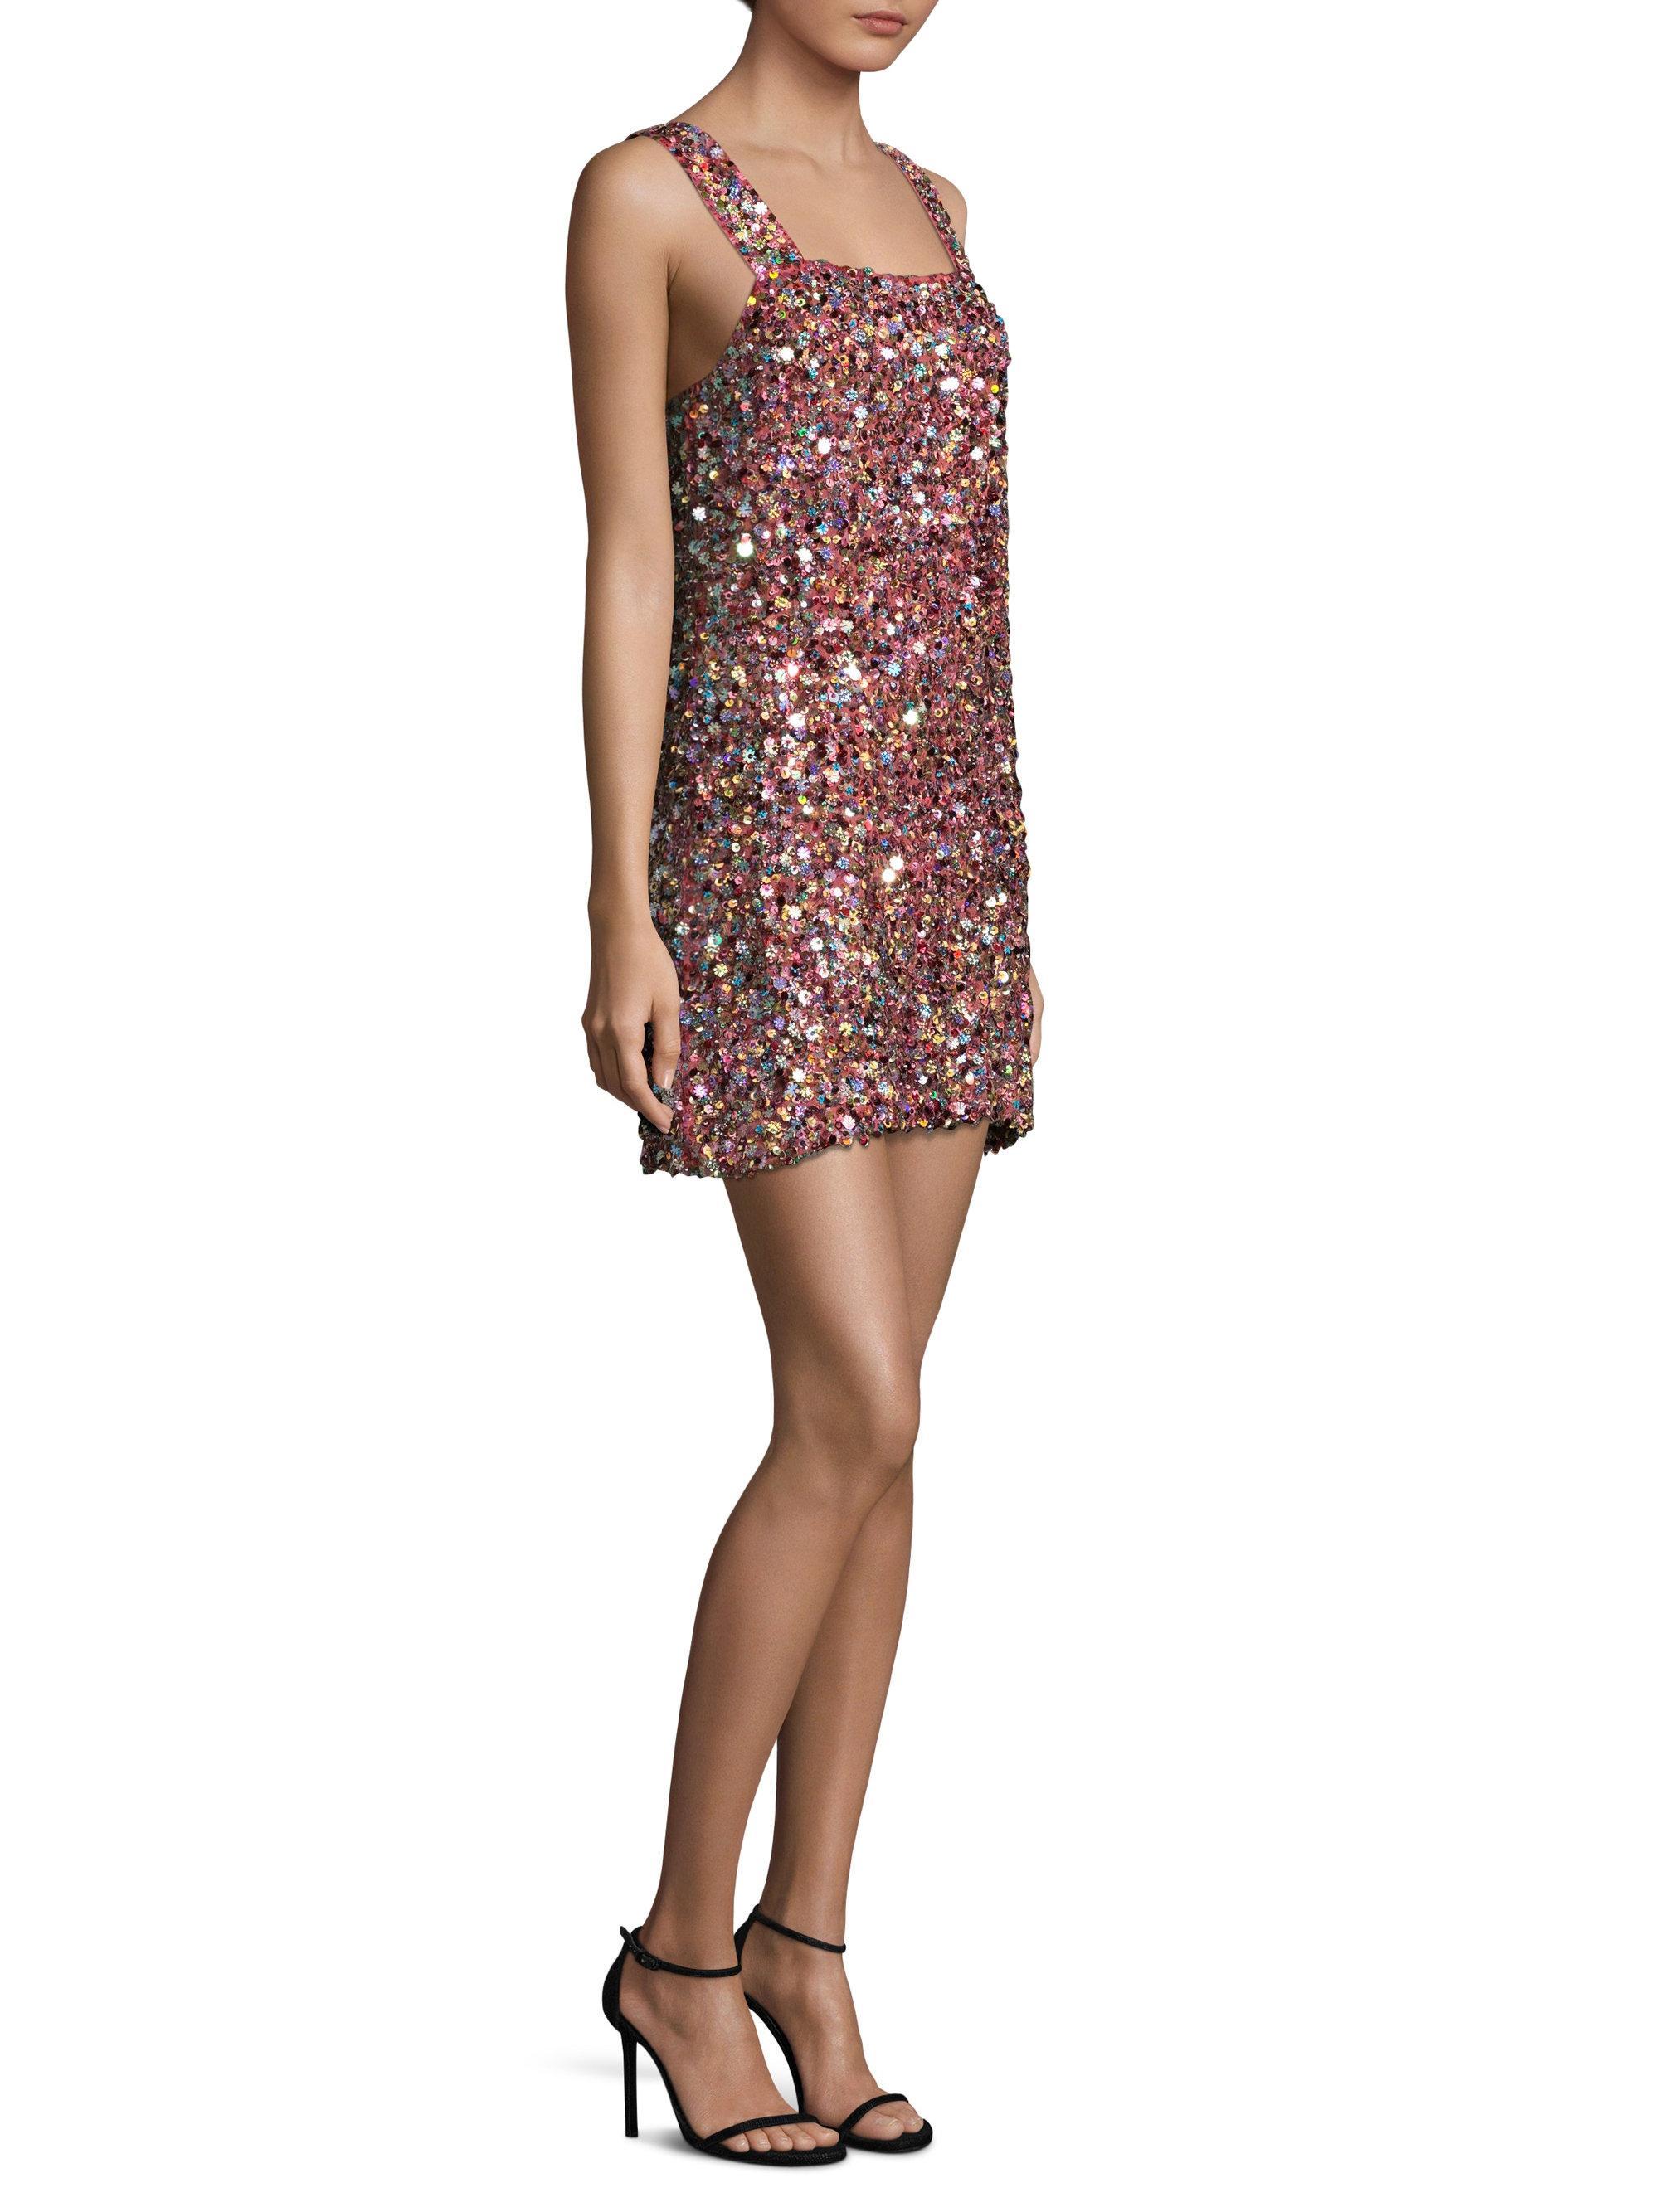 de mini seda con multicolor talla Alexis lentejuelas L Vestido w5OtqE